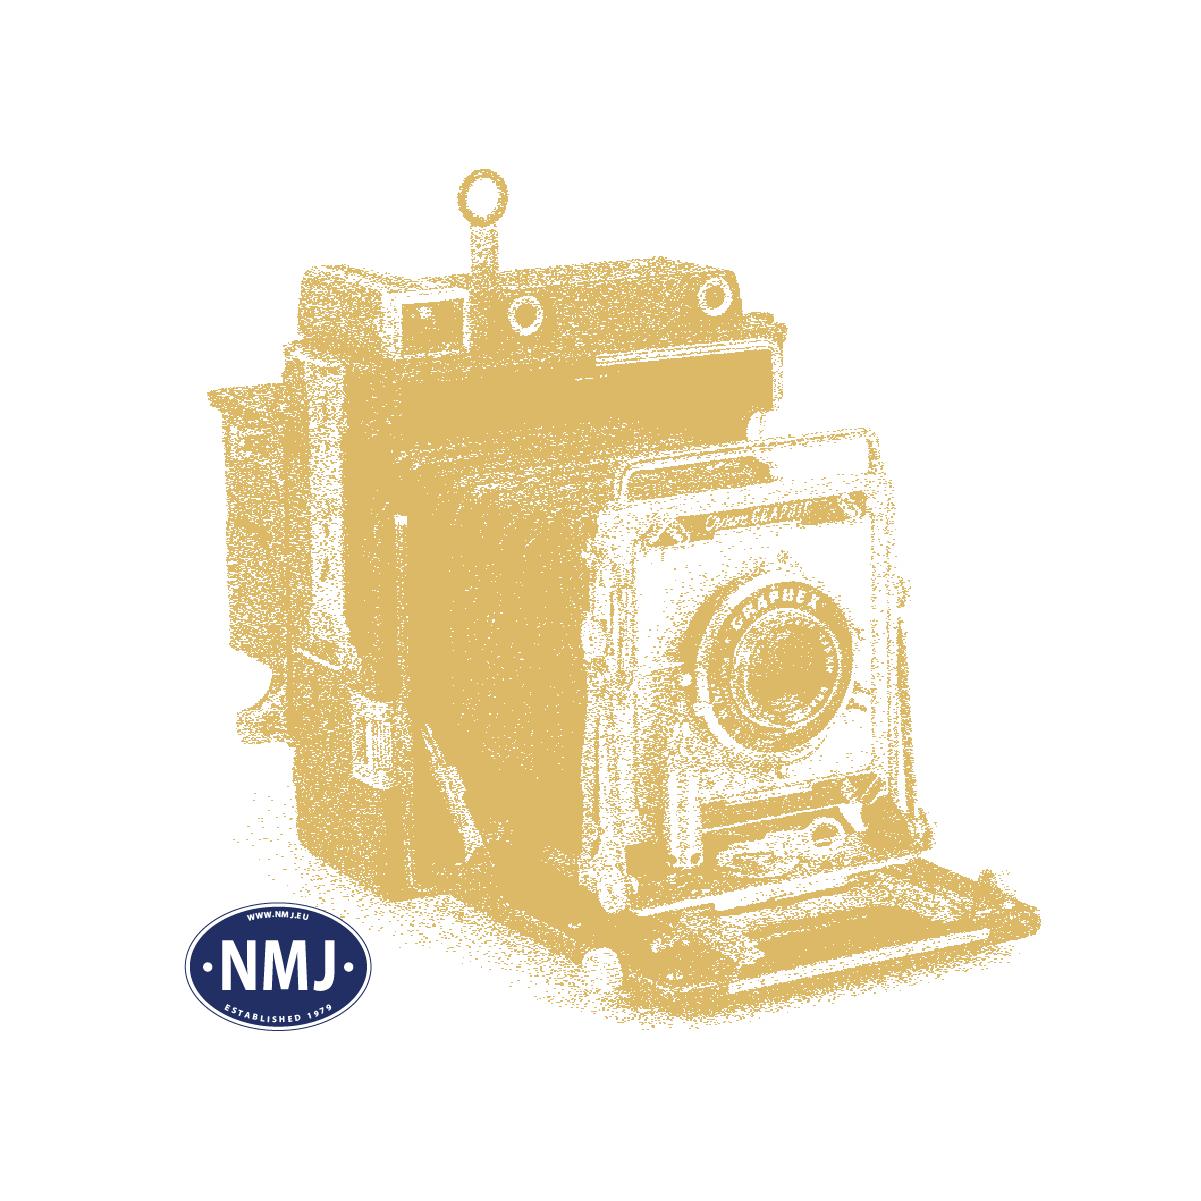 "NMJT106.306 - NMJ Topline Salonwagen CB3 21237 ""Barnetoget"" der NSB, rot"